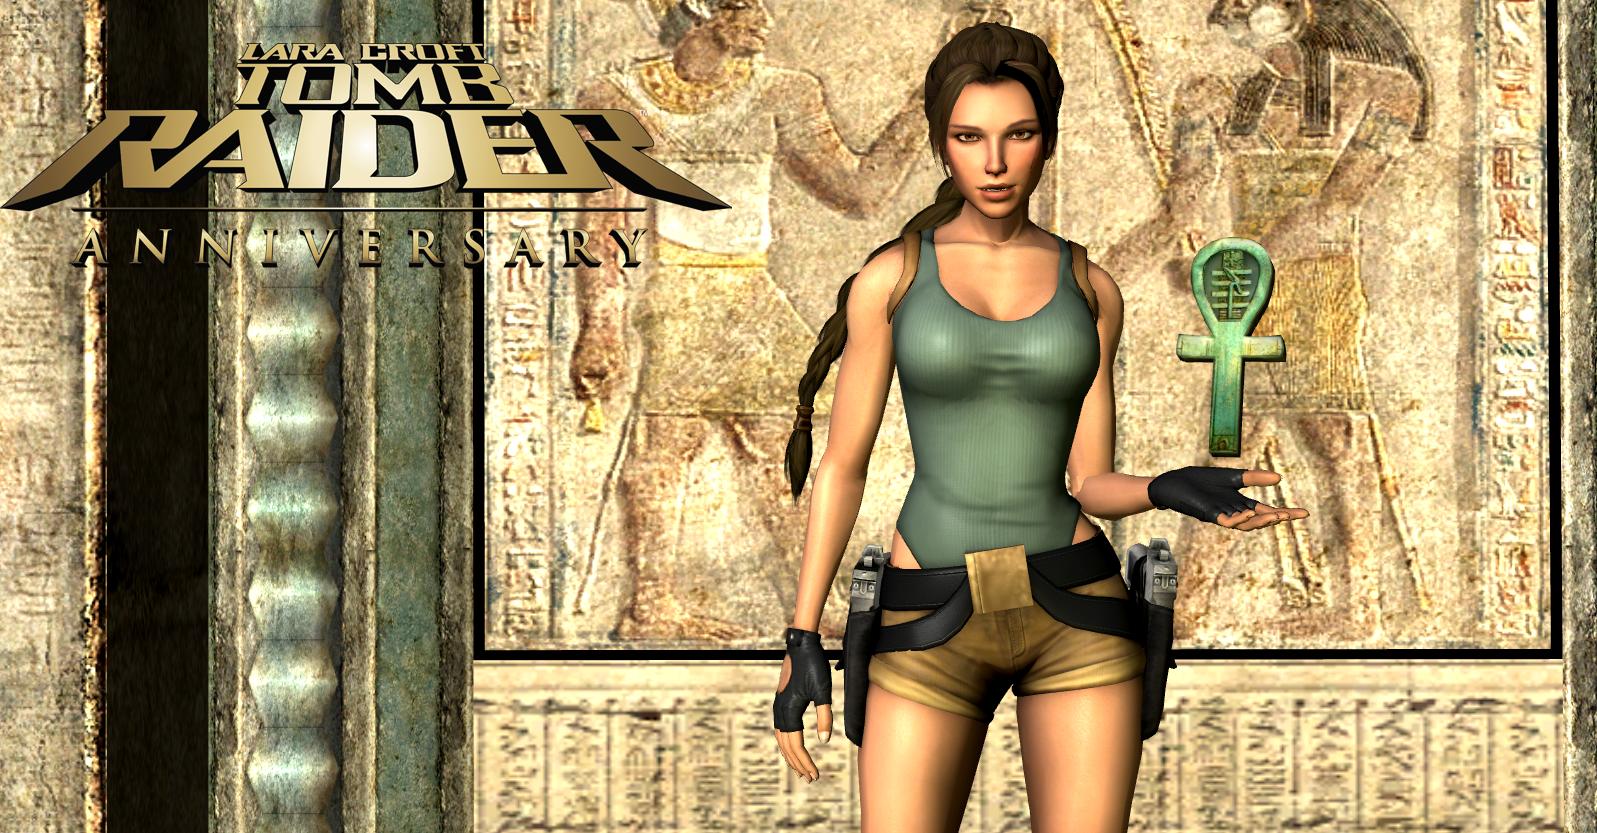 Lara croft tomb raider anniversary big booty  smut images